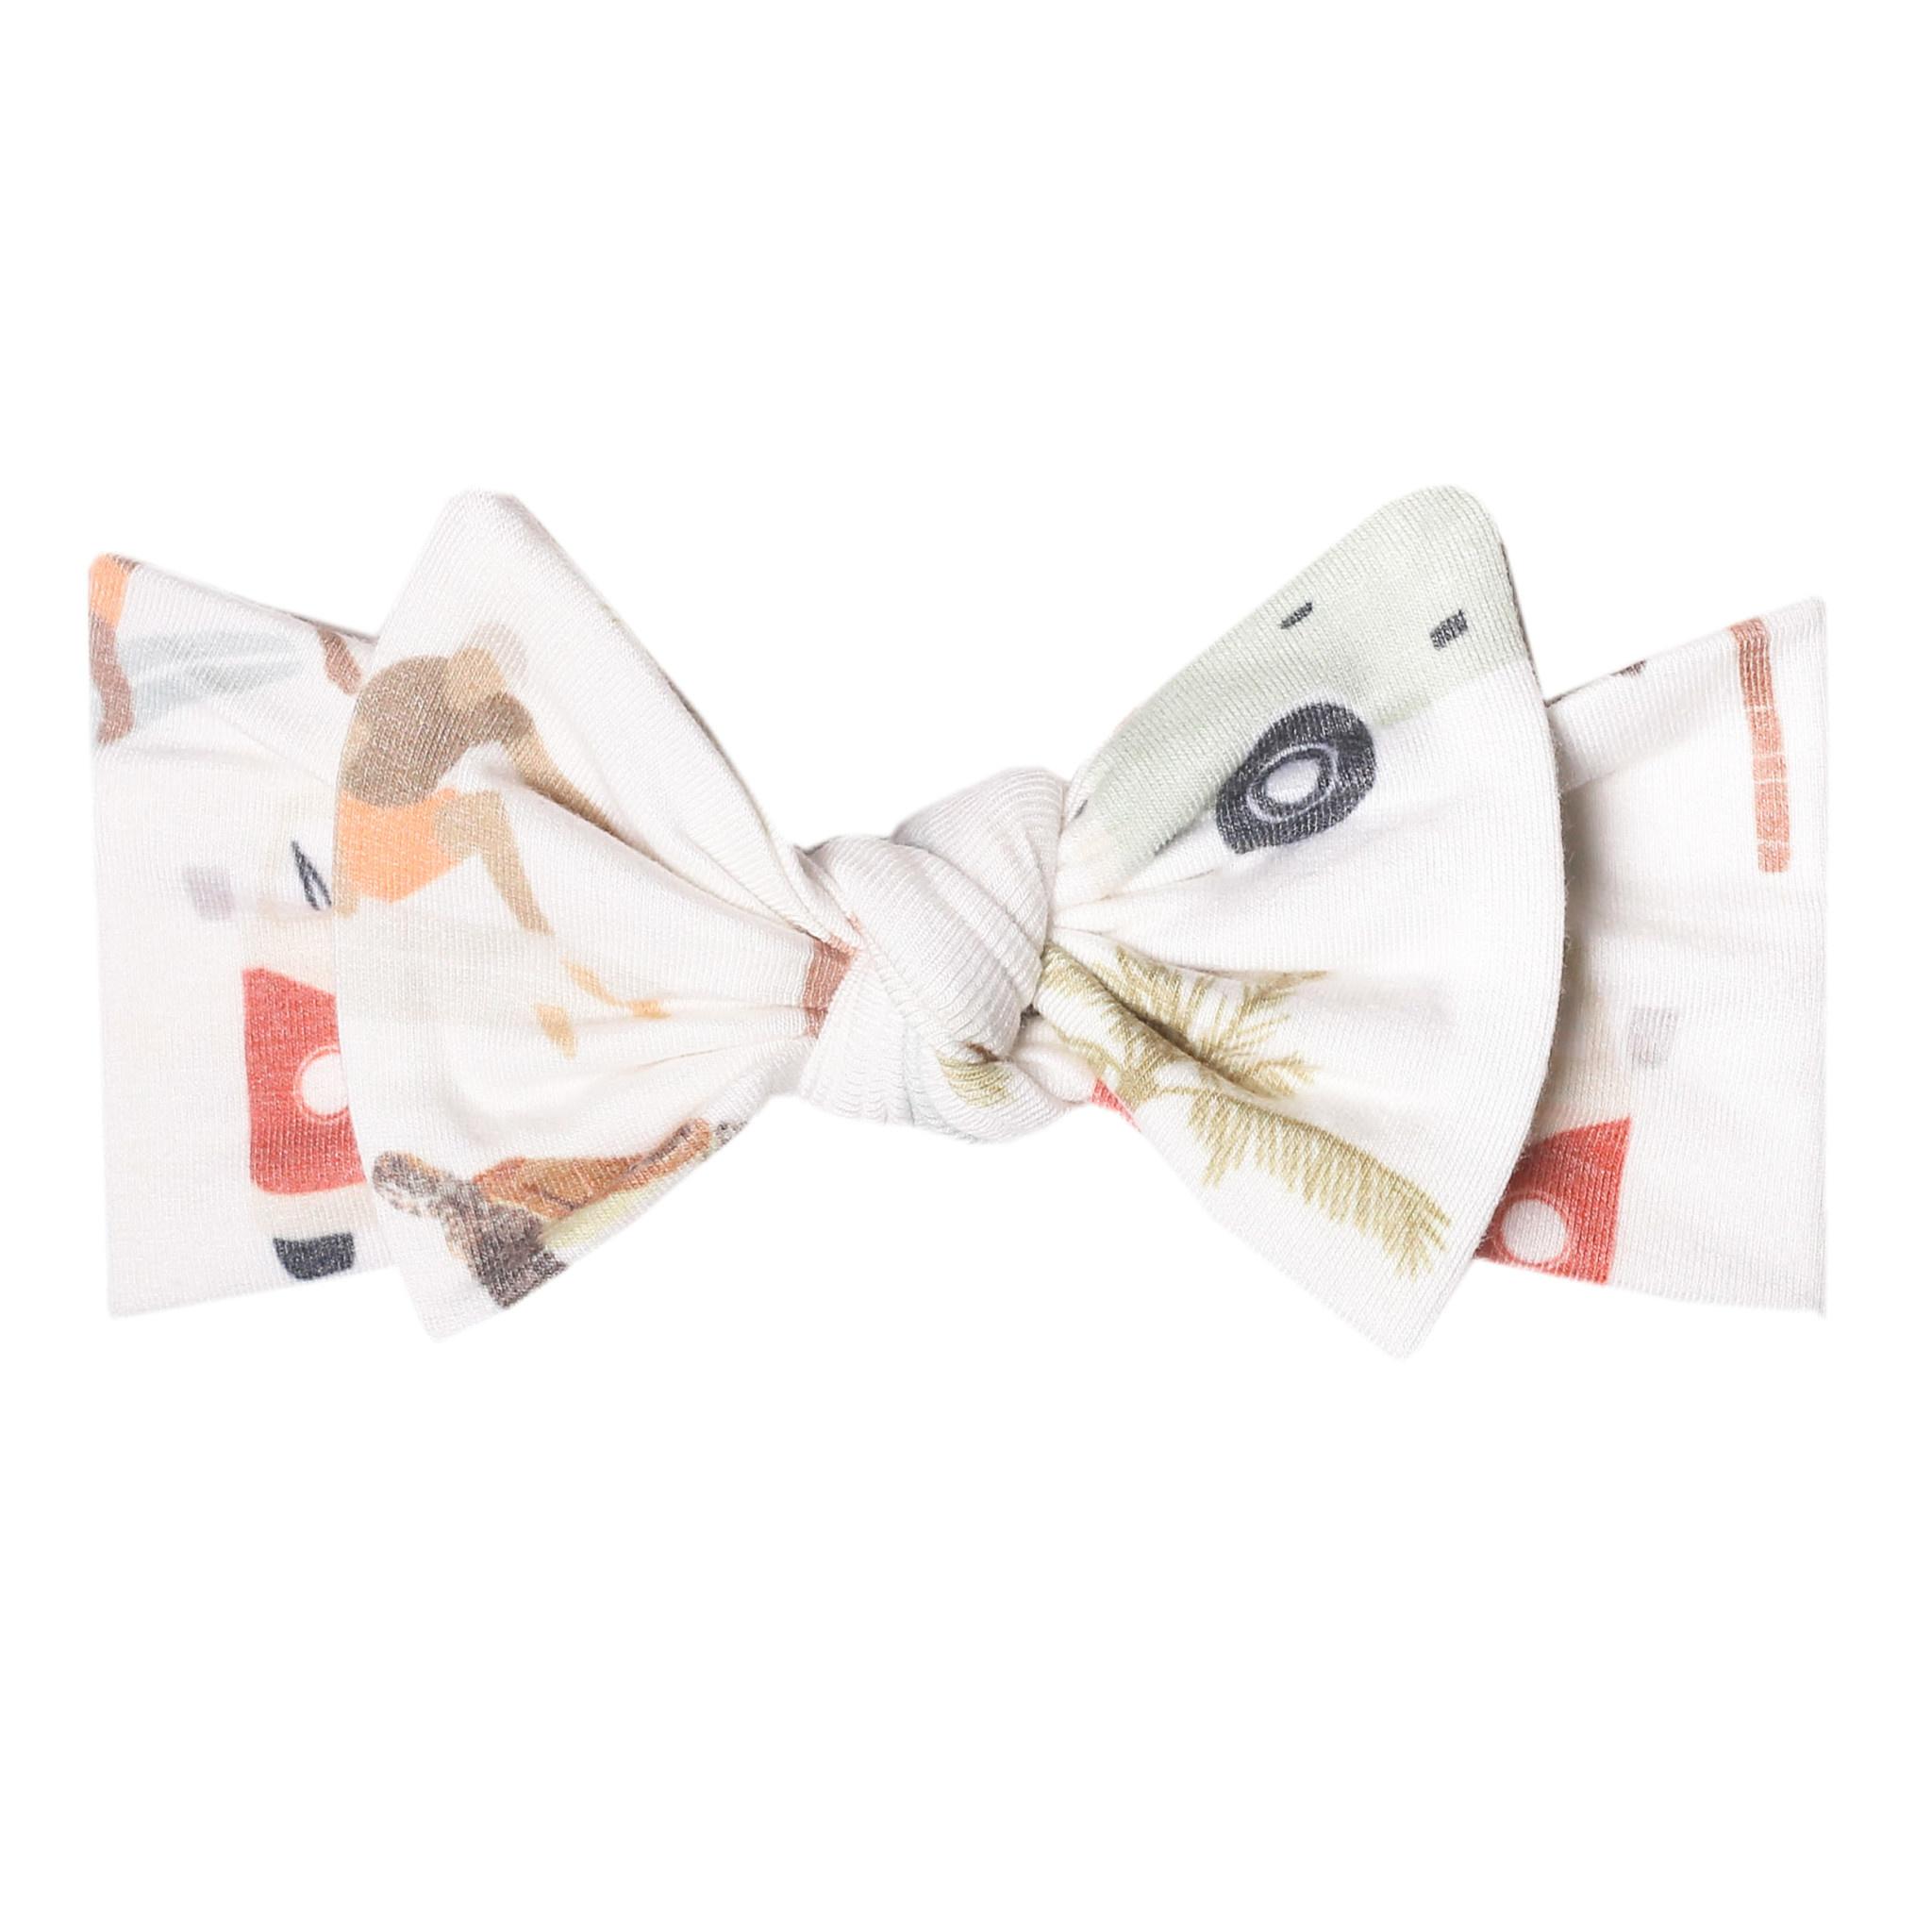 Copper Pearl Knit Headband Maui